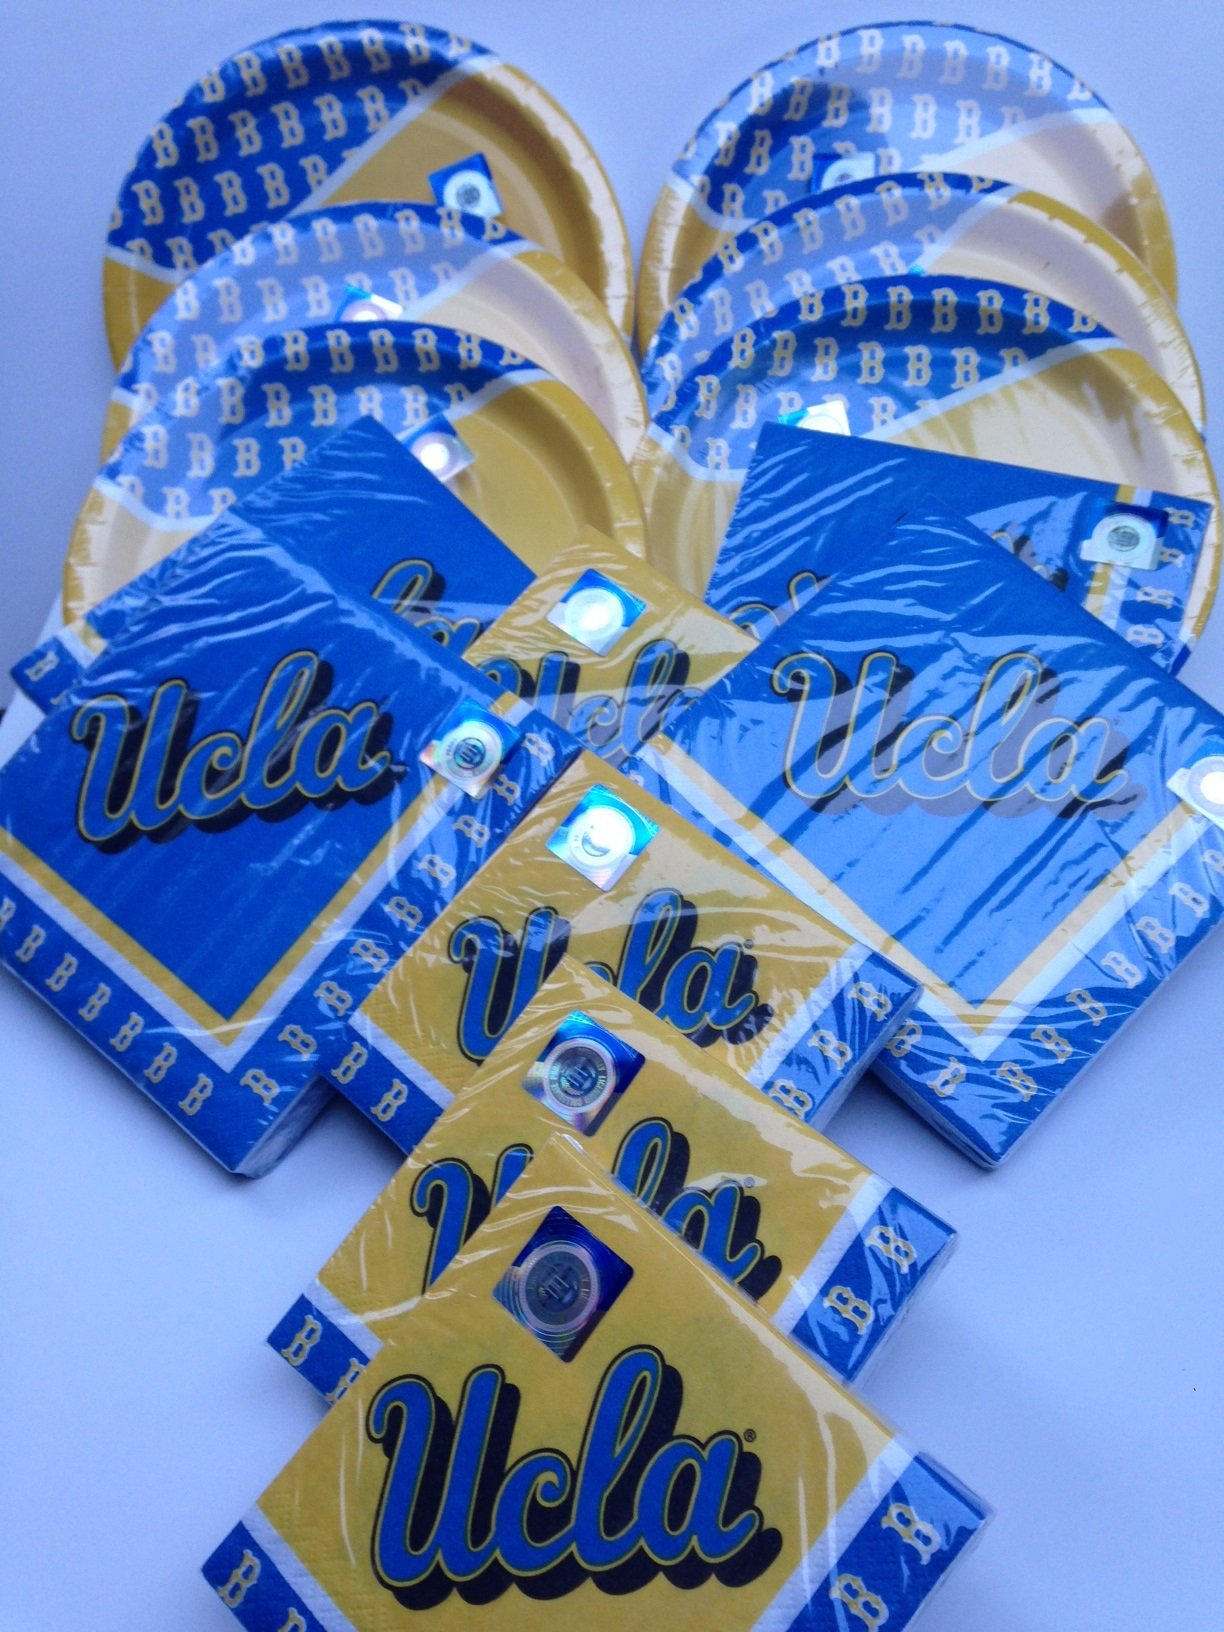 UCLA Tailgating Party,Football fan, 48 plates, 80 large napkins, 80 small napkins